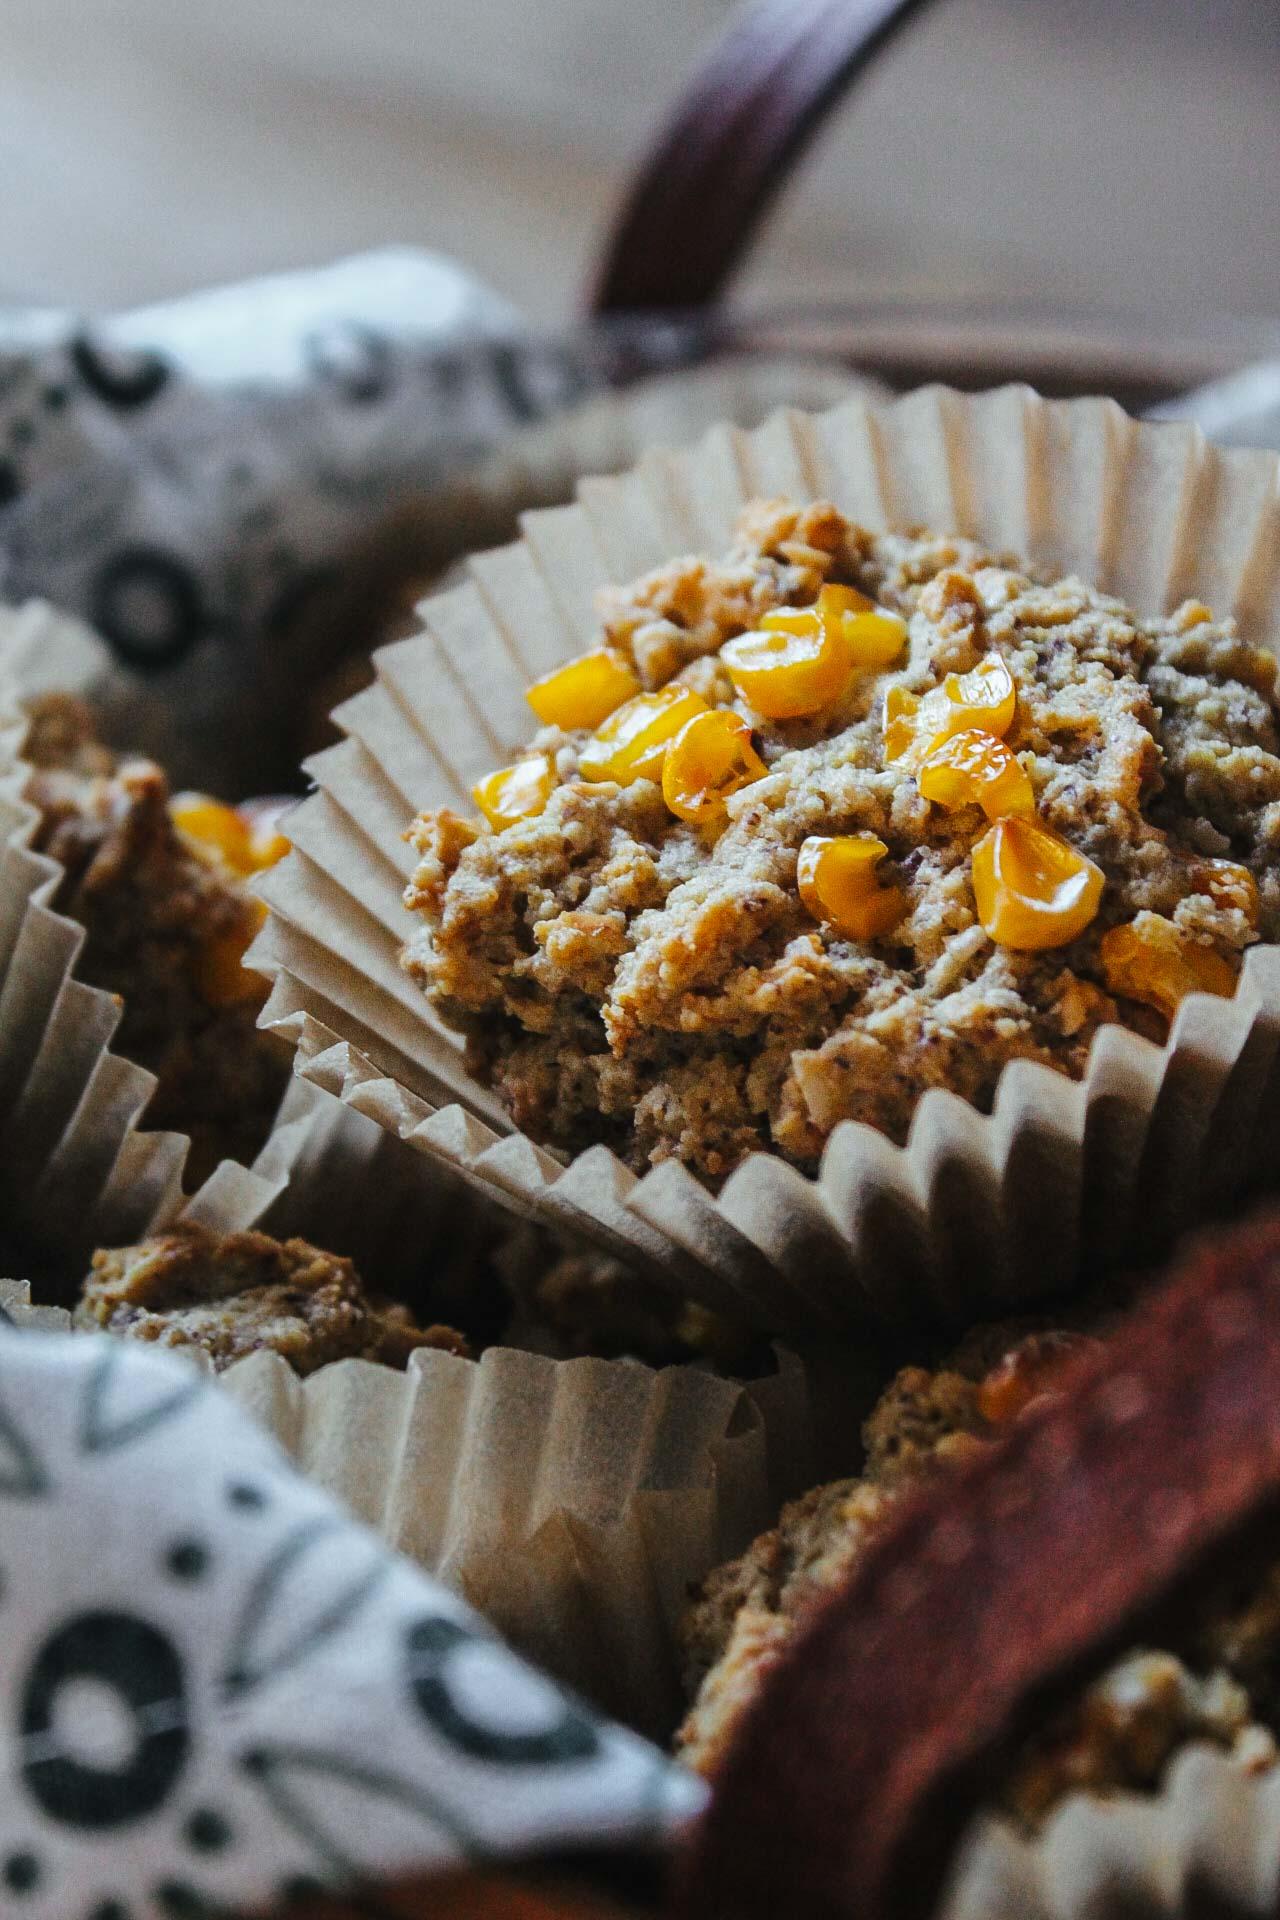 Gluten-Free Cornbread Muffins #wheat-free #bread #vegan #cornbread #football #wfpb #wfpbno #mcdougal #recipes #muffins #side